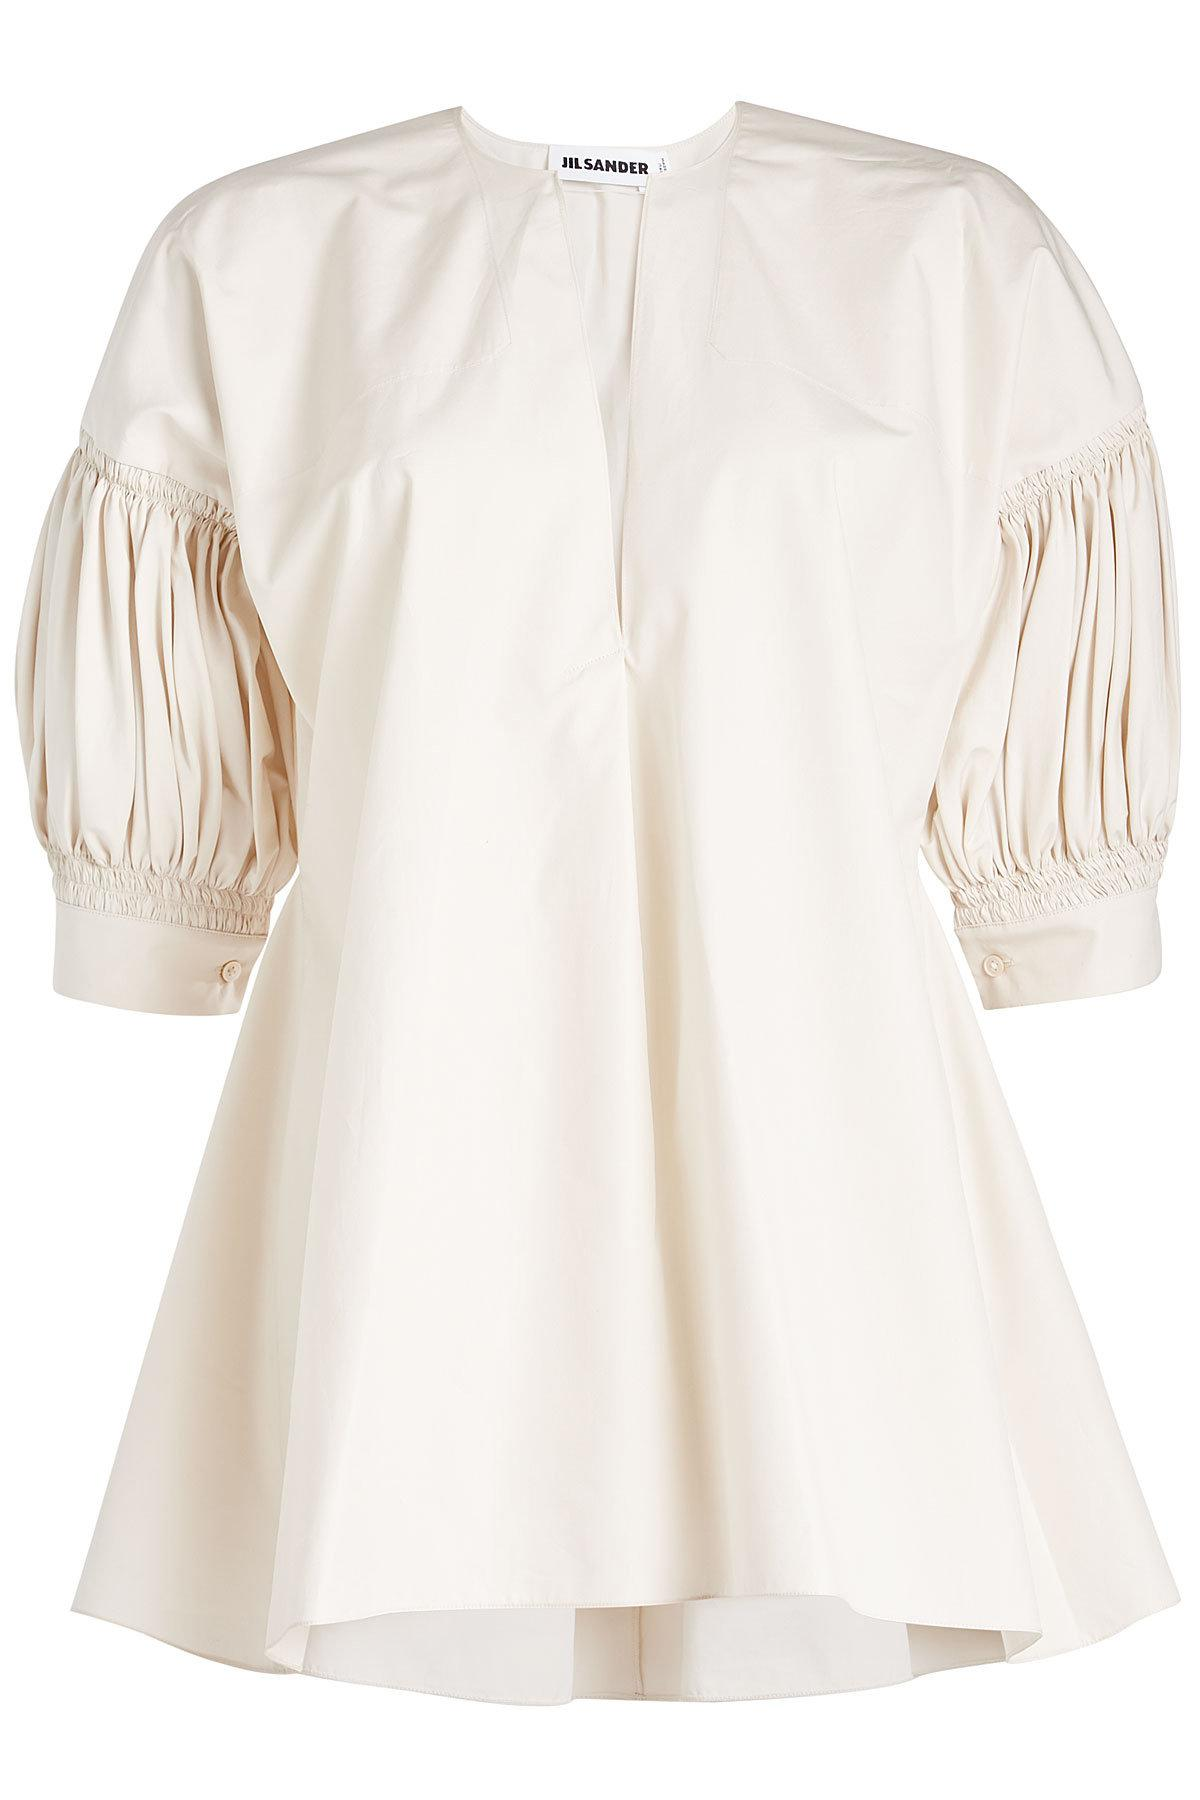 89b7904b45573 Jil Sander Estro Cotton Blouse in White - Lyst